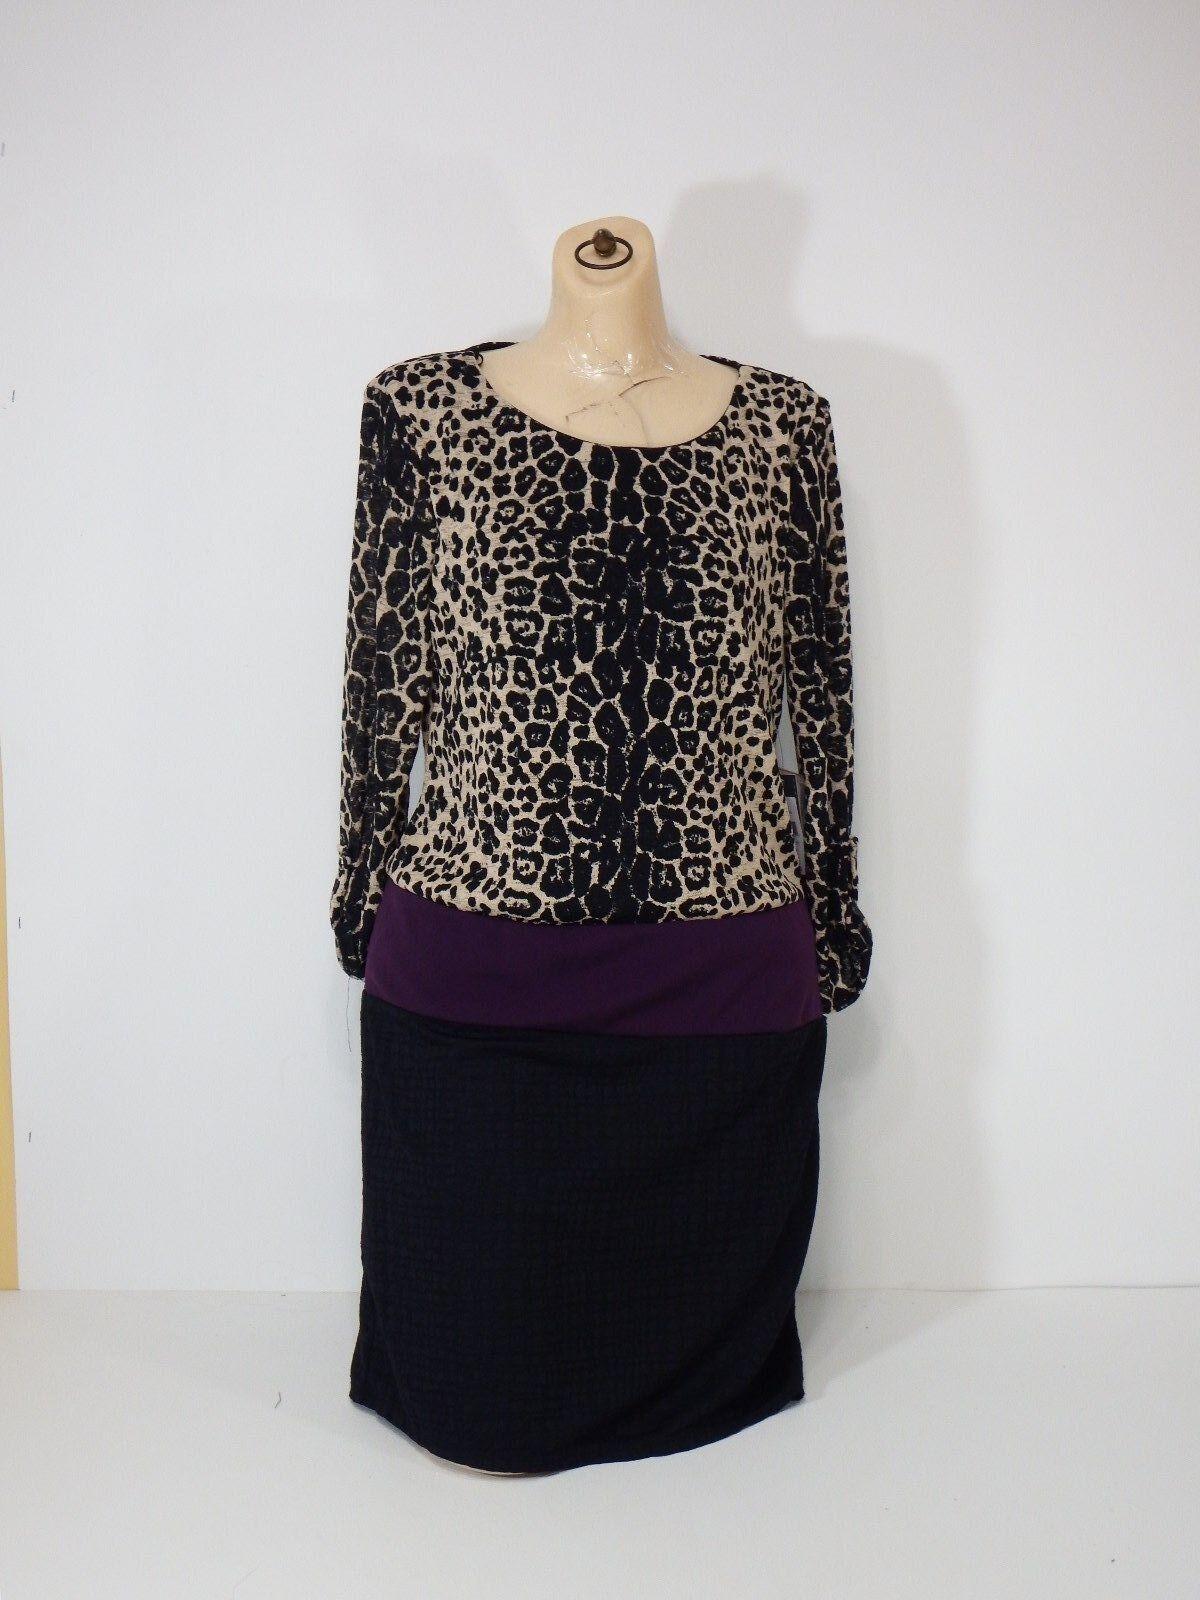 Women dress luxology large formal half sleeve knee length comfortable zipper